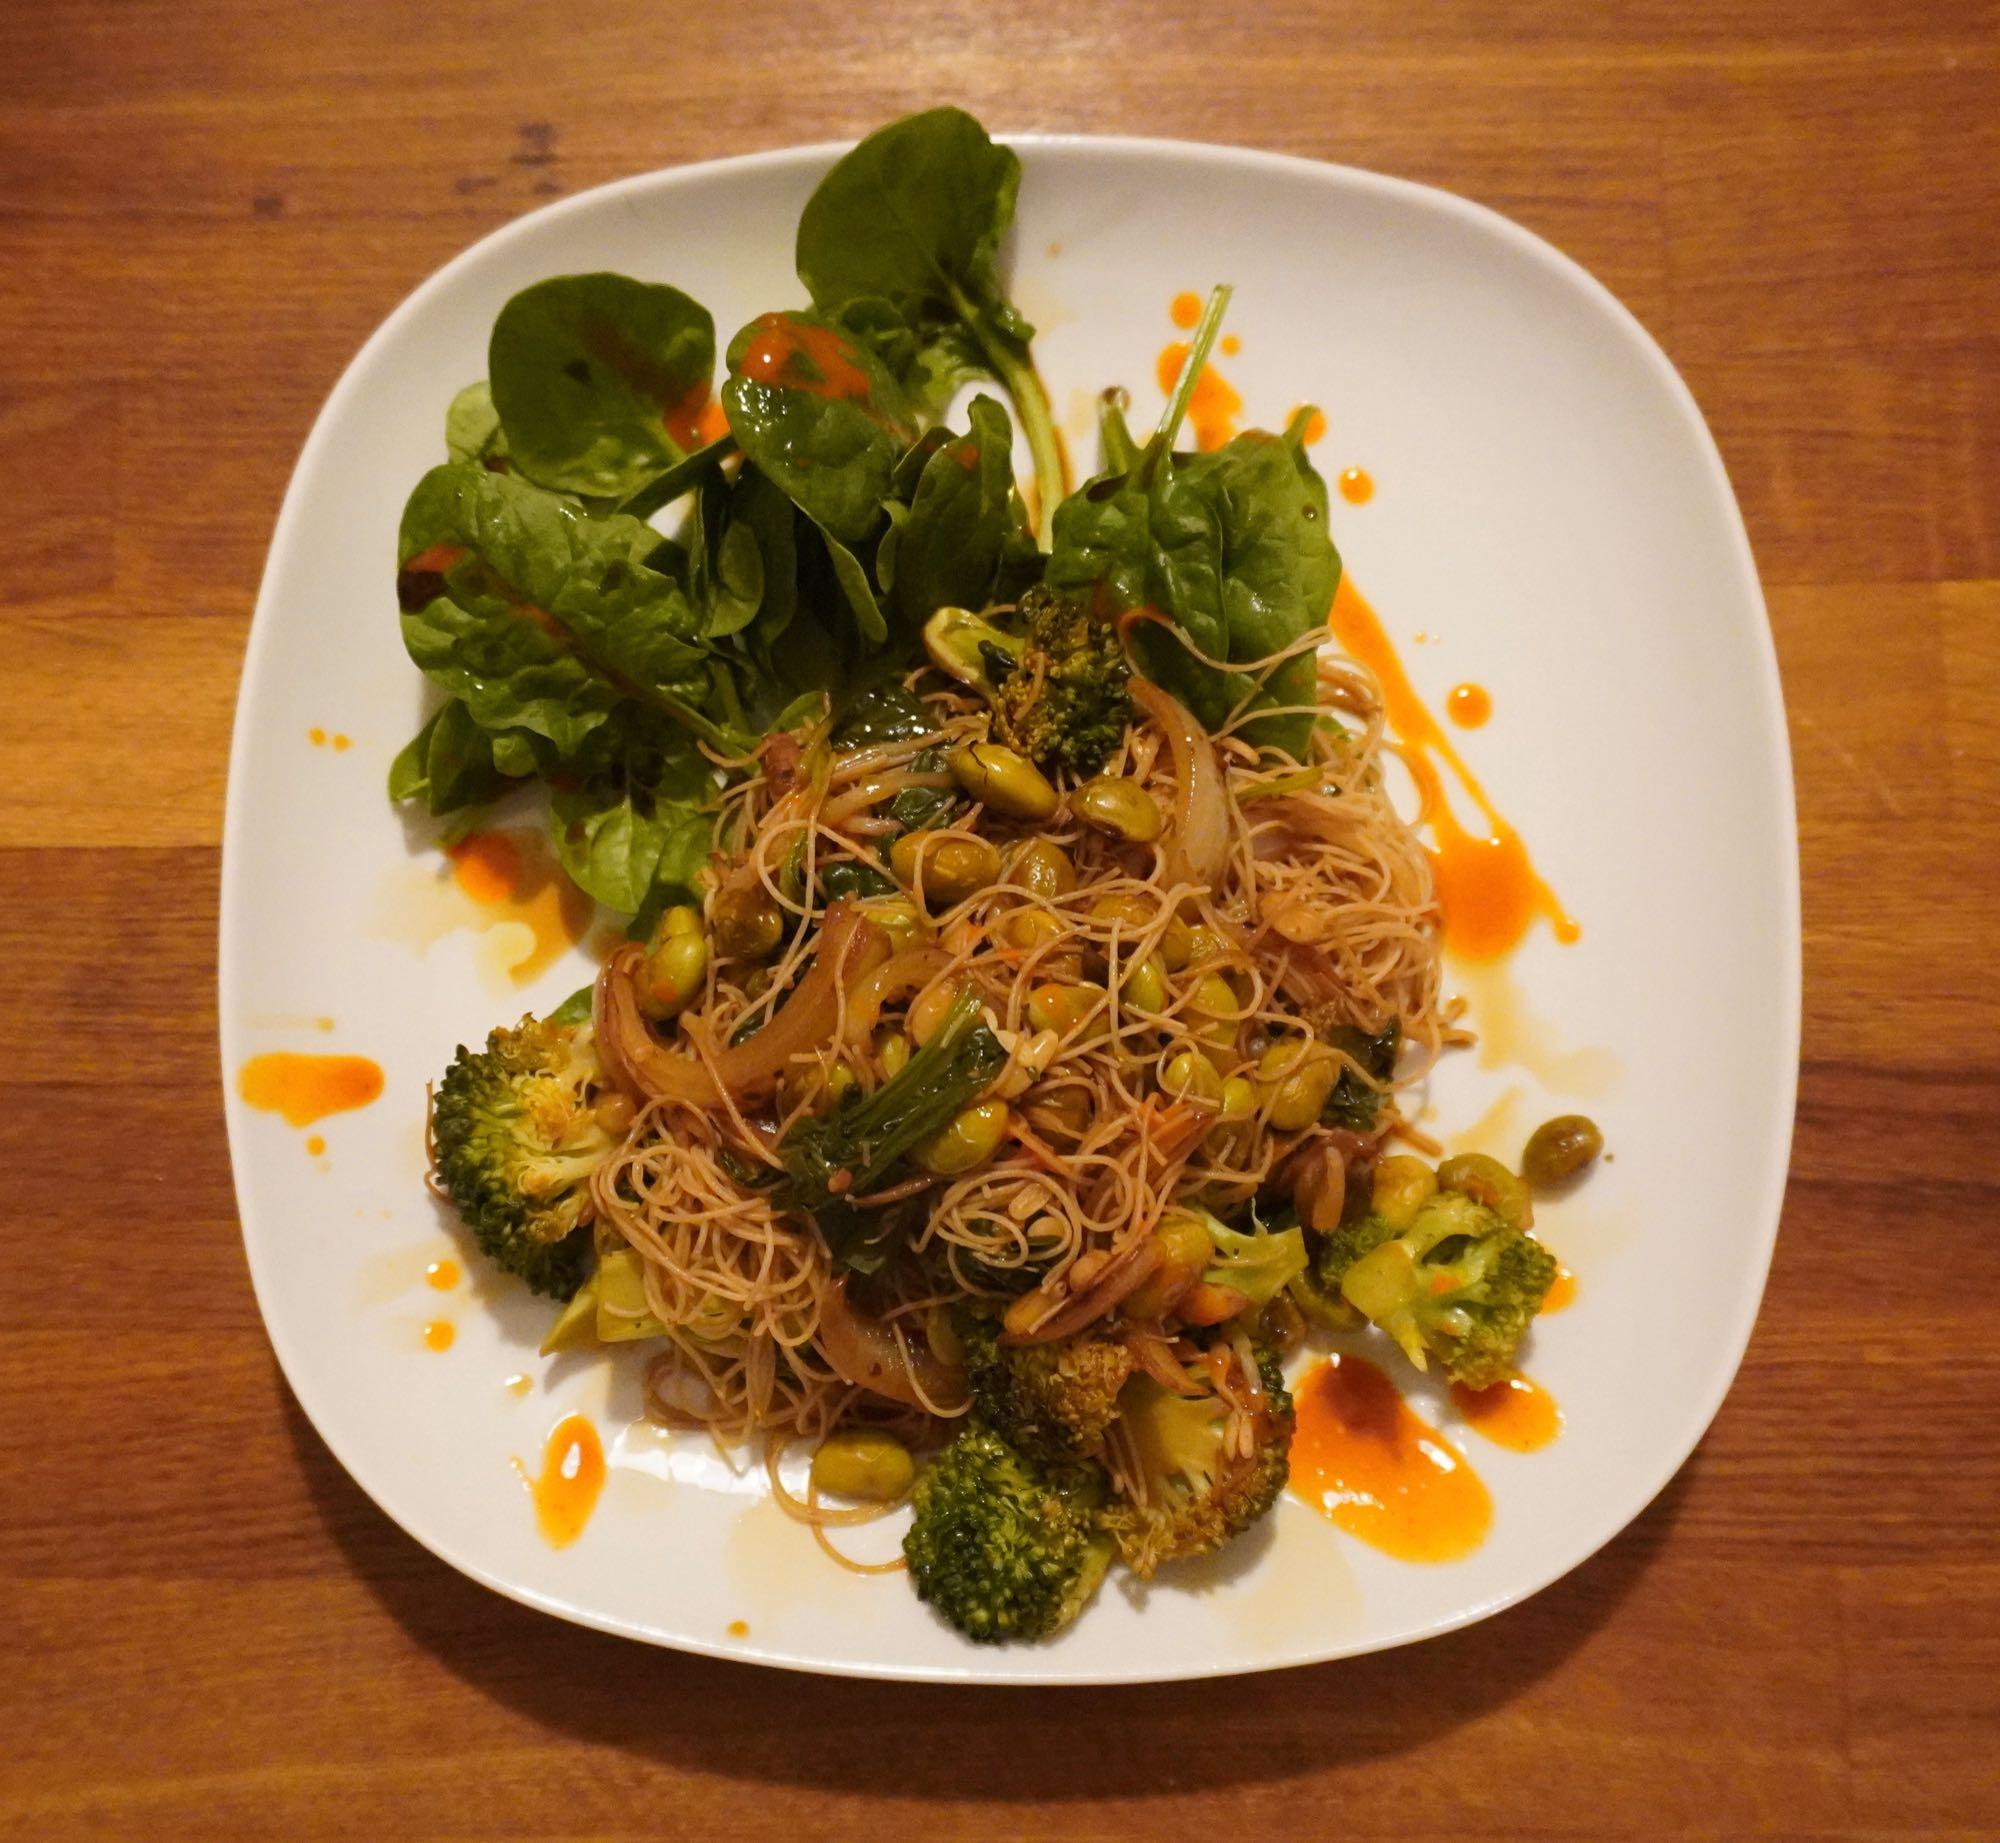 What's for Dinner? Vegetarian Noodles